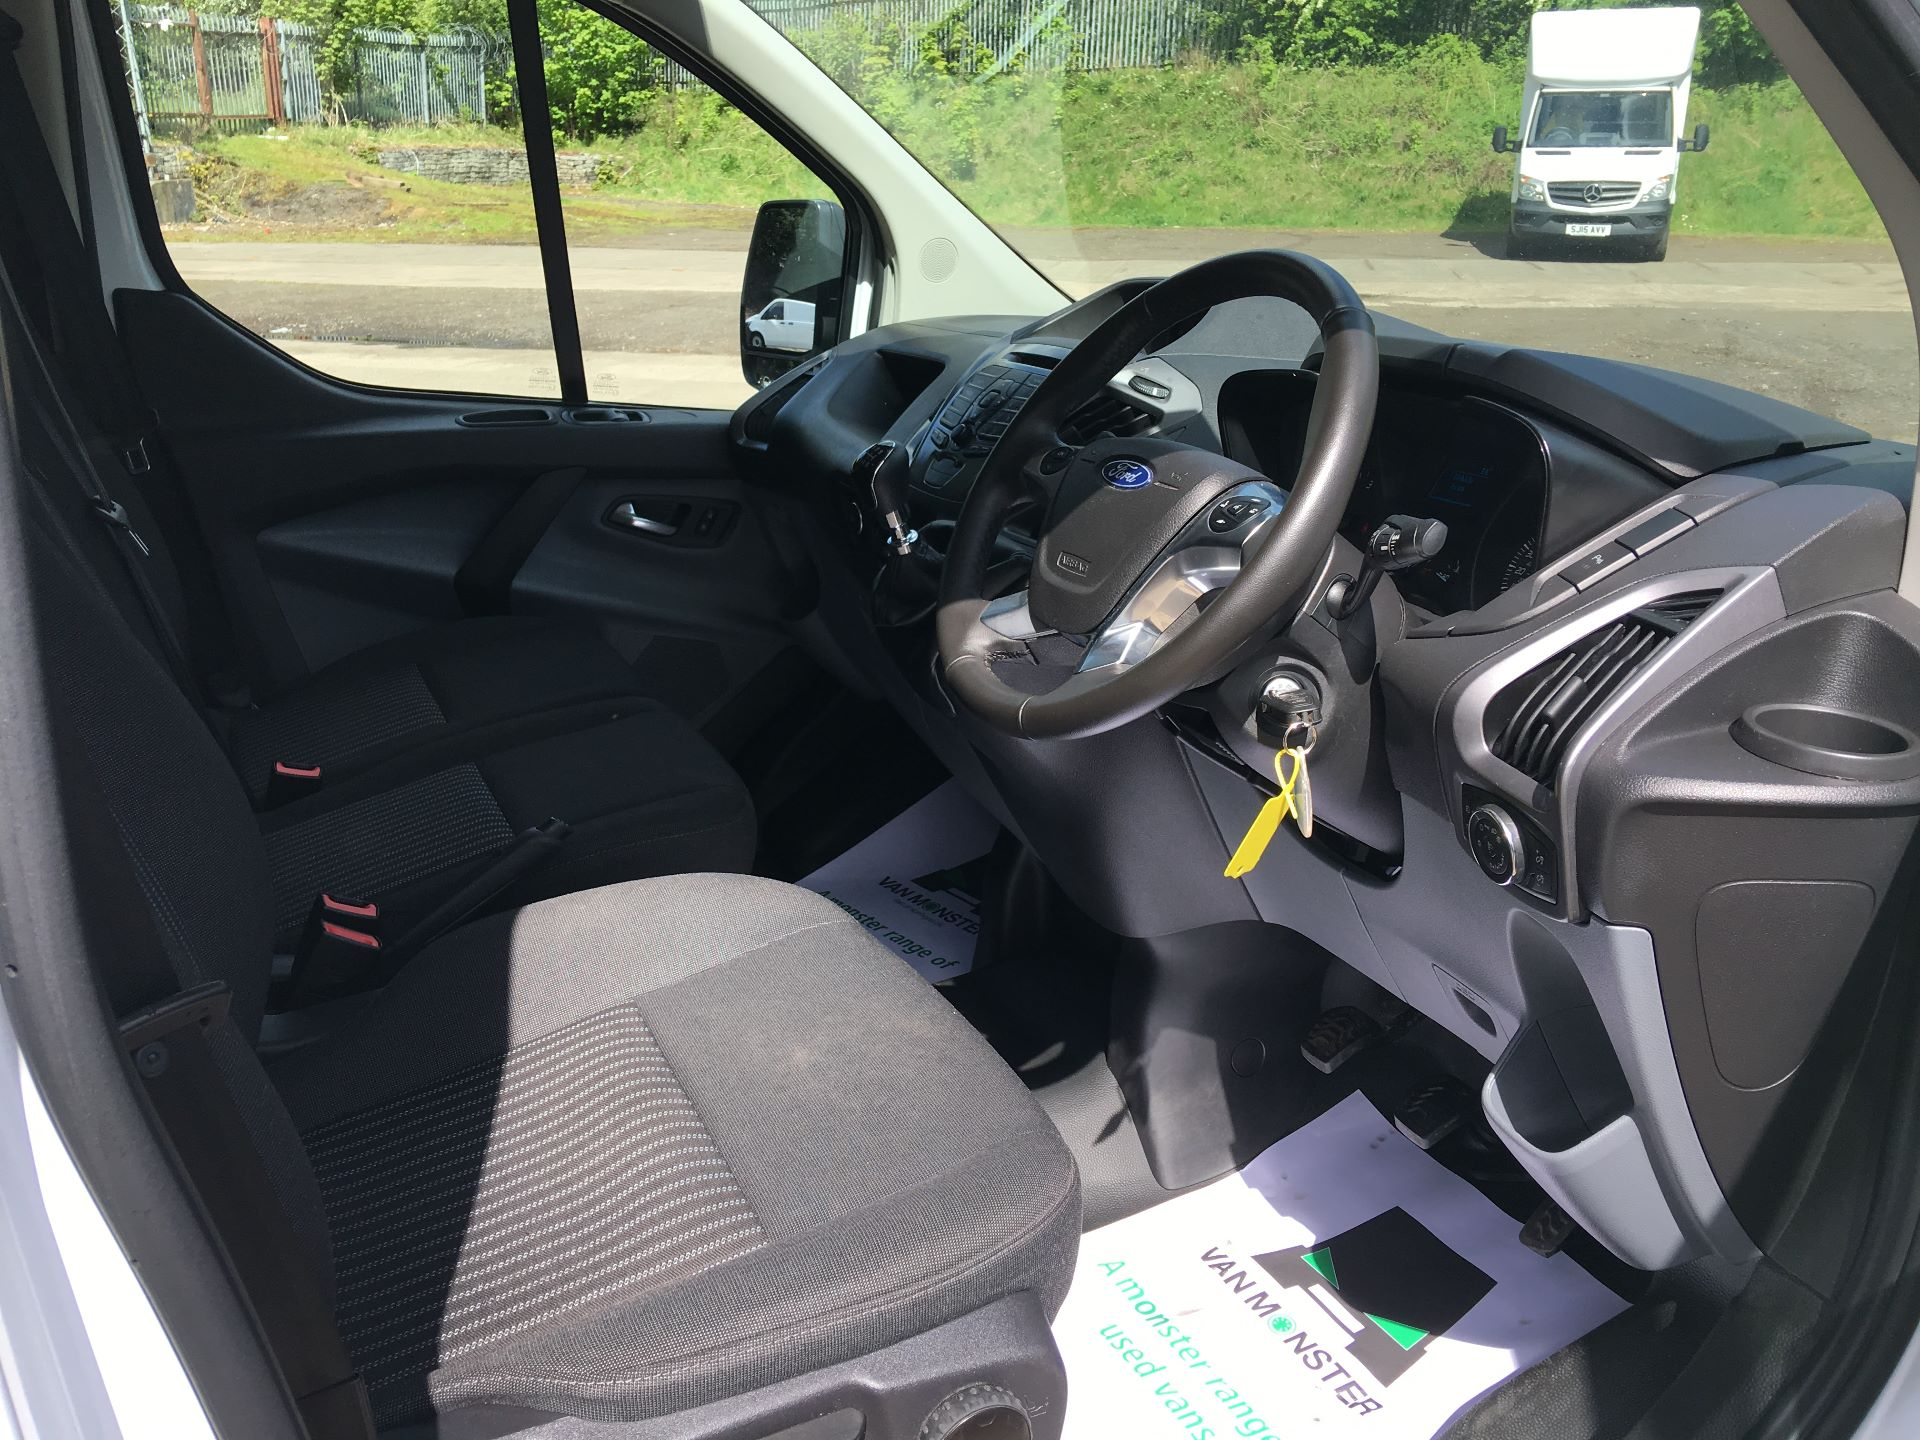 2018 Ford Transit Custom 290 L1 DIESEL FWD 2.0 TDCI 105PS LOW ROOF TREND EURO 6 (SH67VDK) Image 2